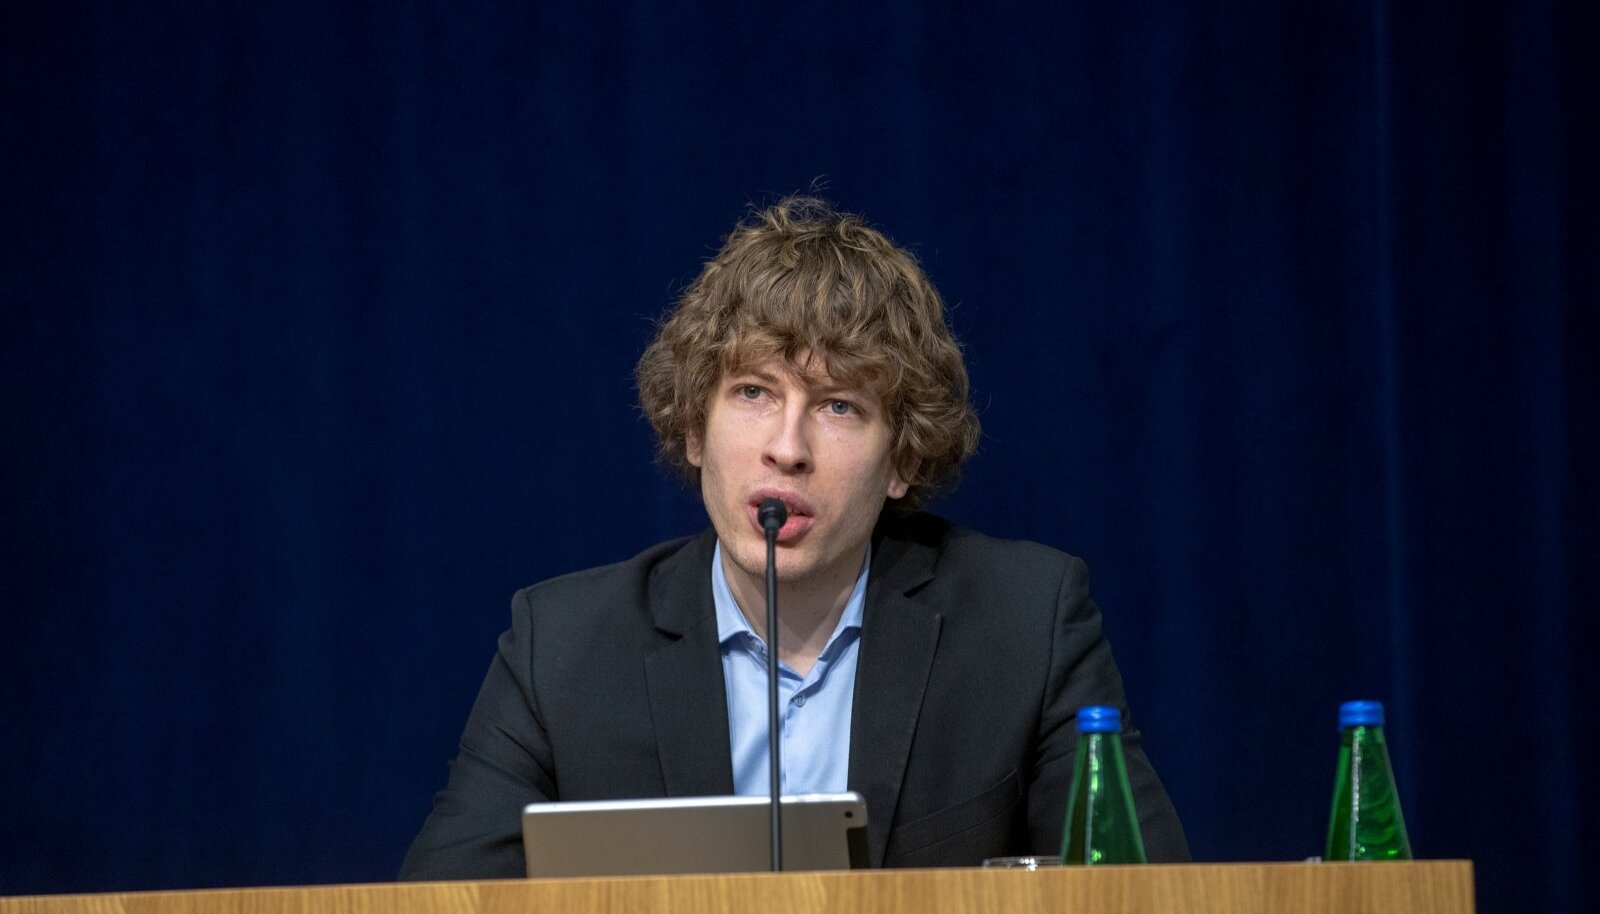 Valitsuse pressikonverents 28.01.21, Tanel Kiik